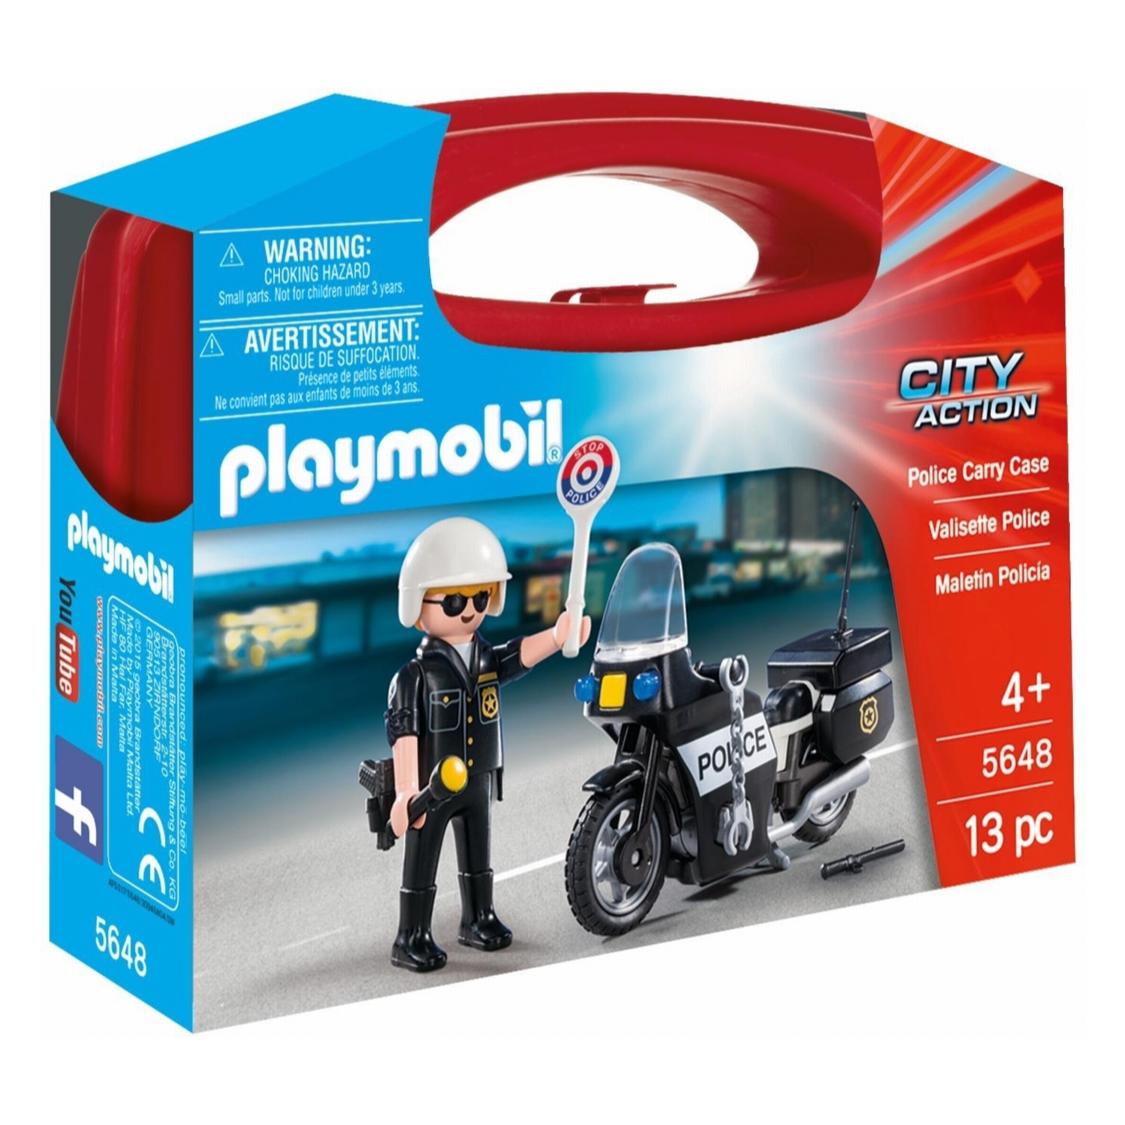 PLAYMOBIL PMB6923 PLAYMOBIL POLICE BIKE WITH LED LIGHT